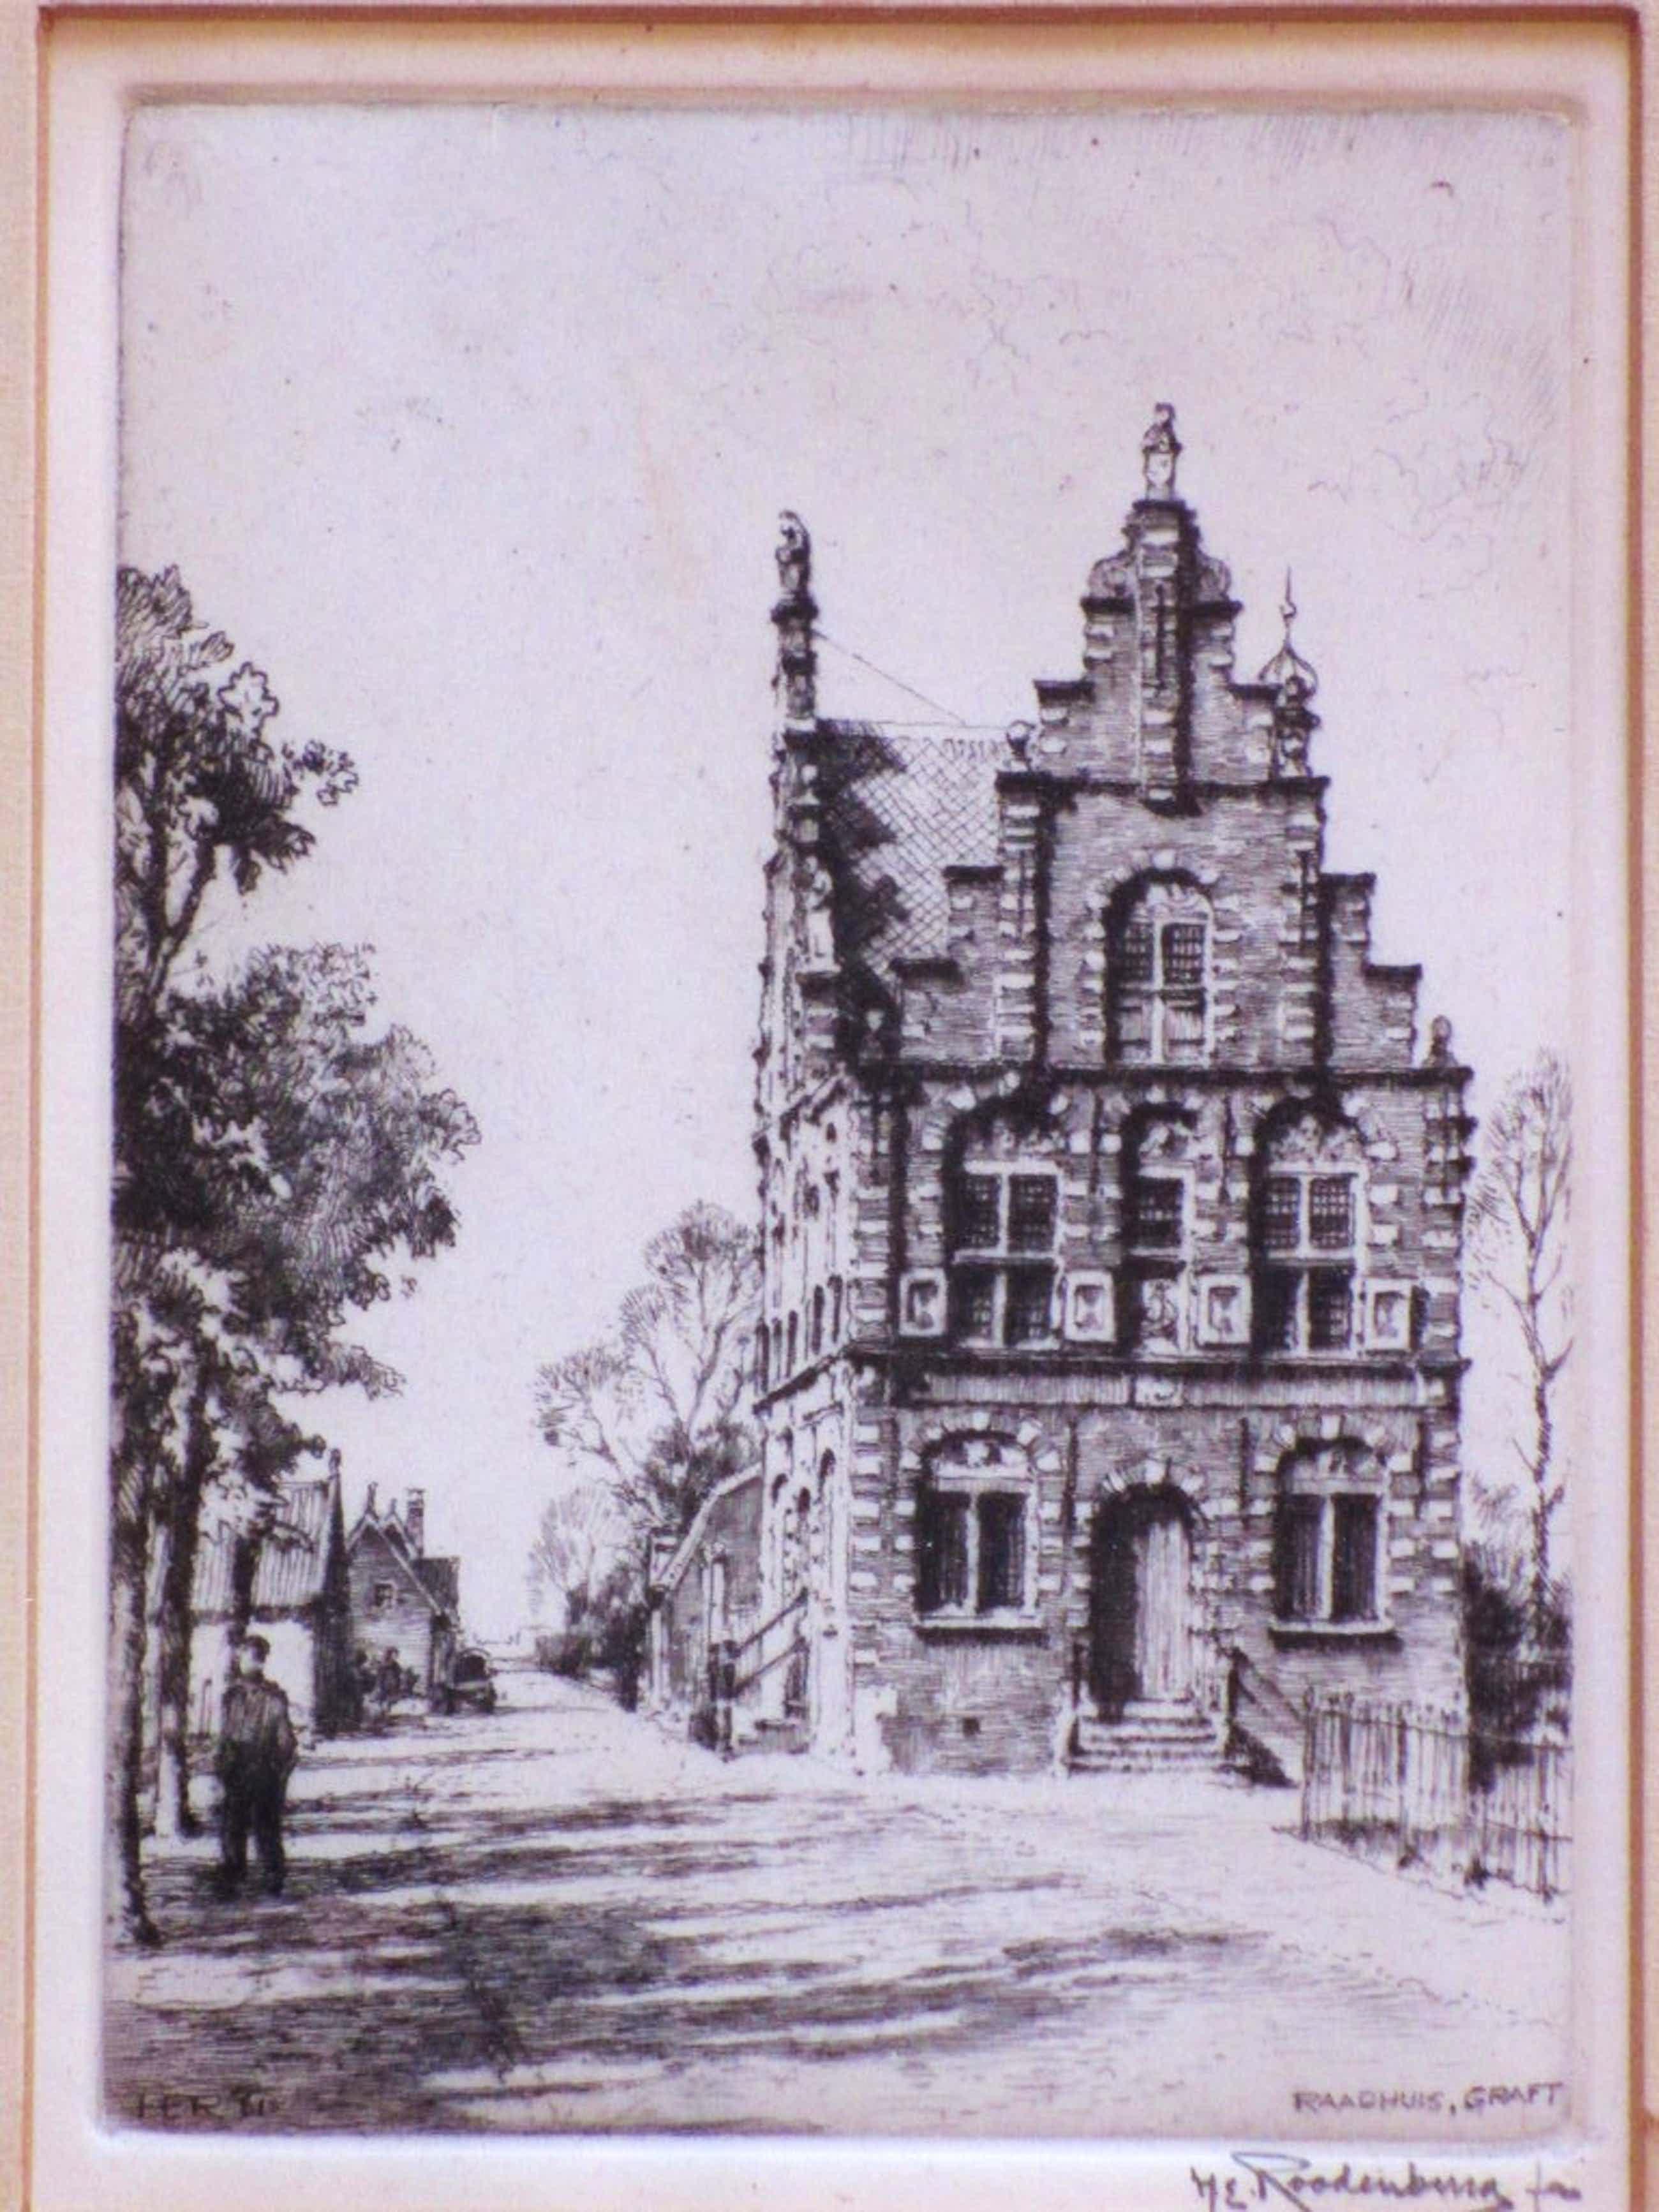 Hendrikus Roodenburg - Hendrik Roodenburg, Raadhuis Graft, Ets kopen? Bied vanaf 35!